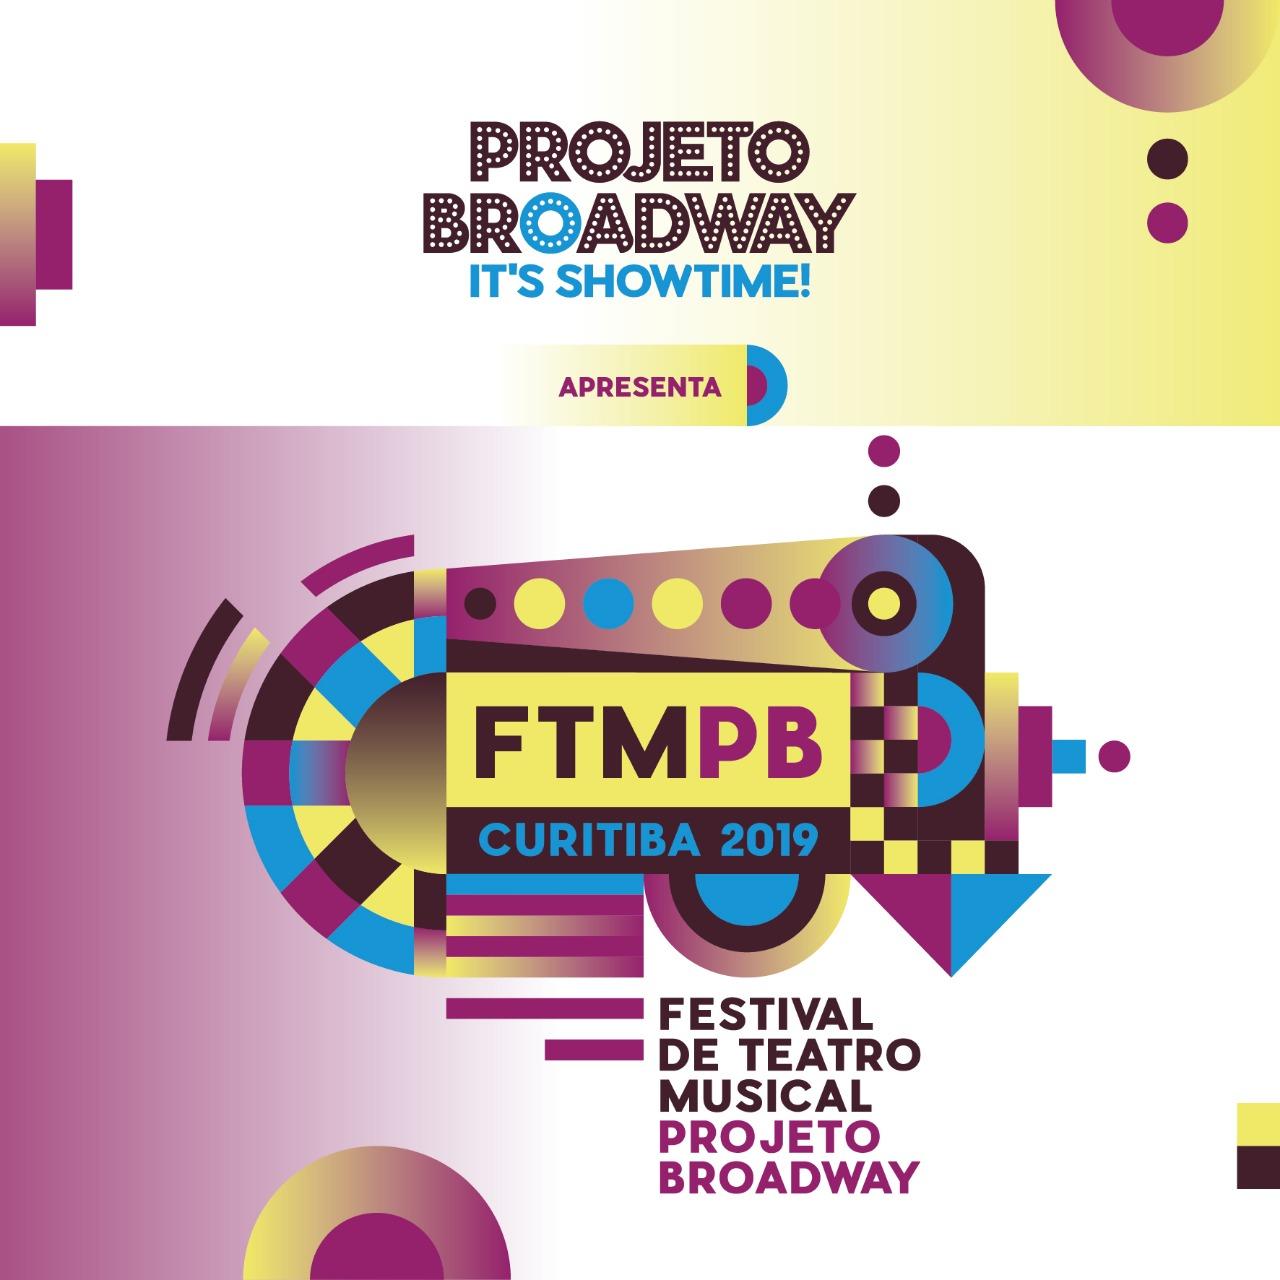 Festival de Teatro Musical